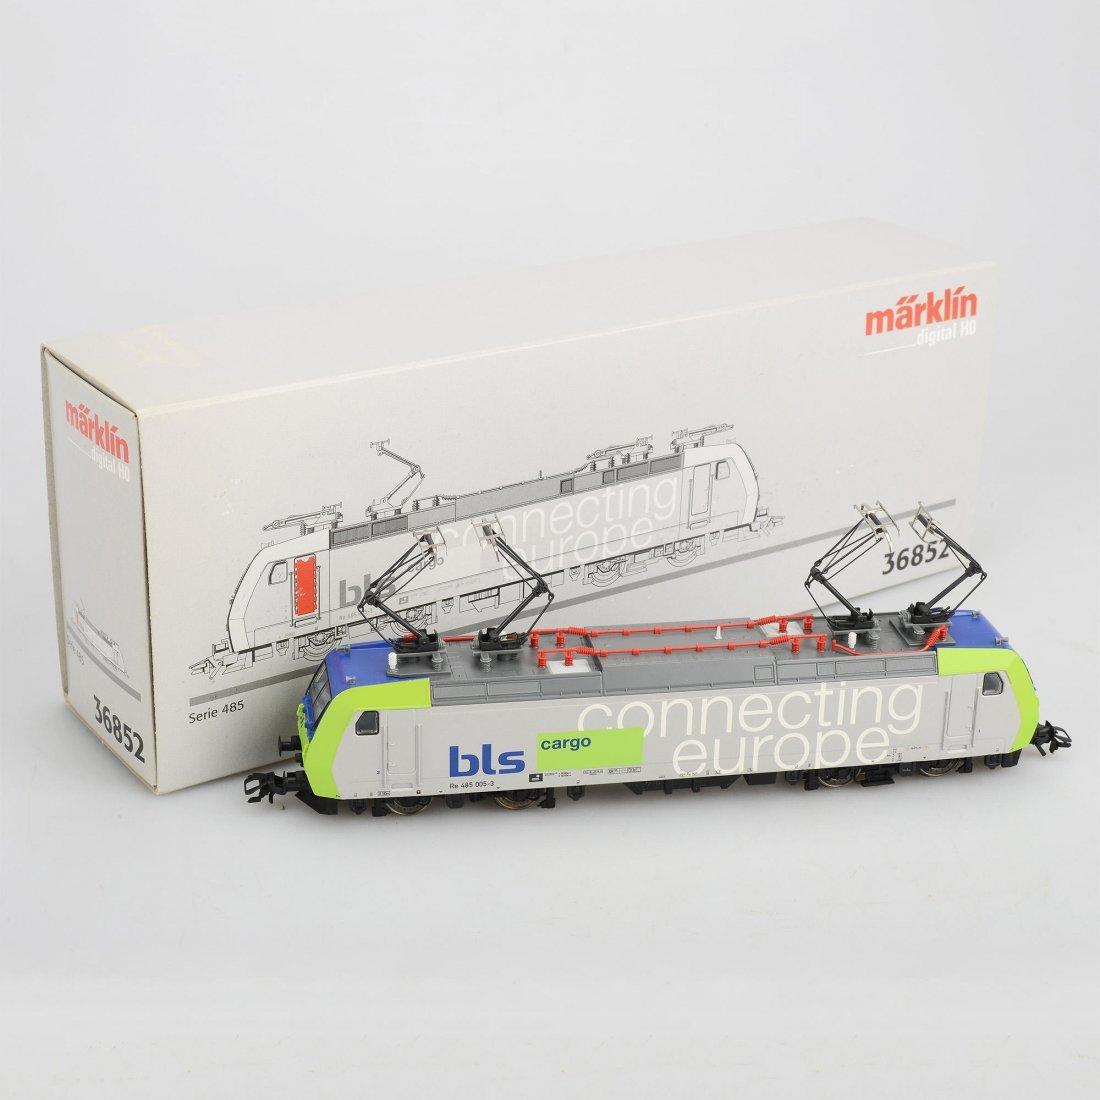 ELLOK, 36852, Marklin, Digital H0